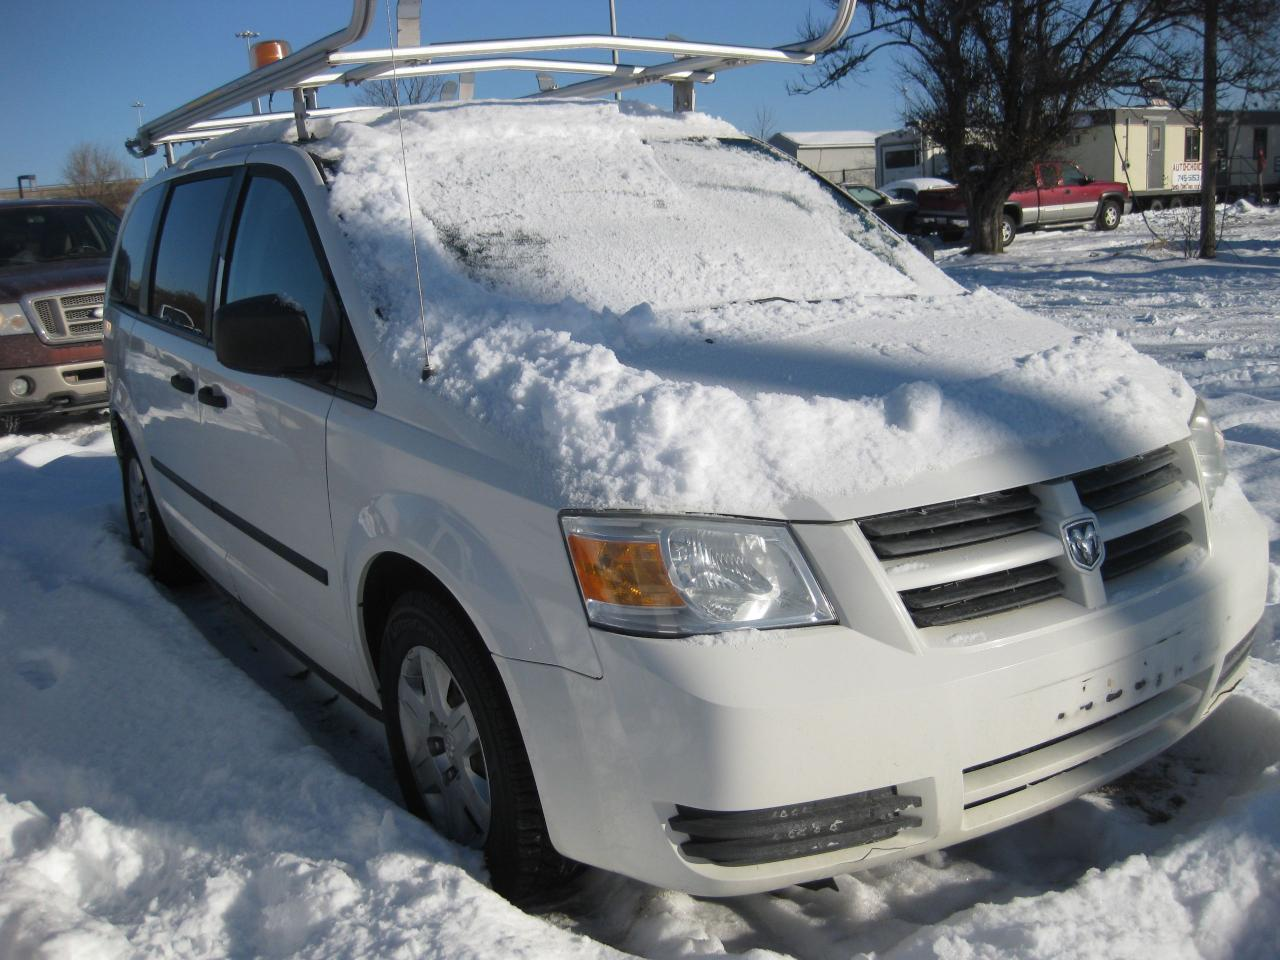 2009 Dodge Grand Caravan C/V AC Shelving Beacon Light Ladder Rack PW PM PL